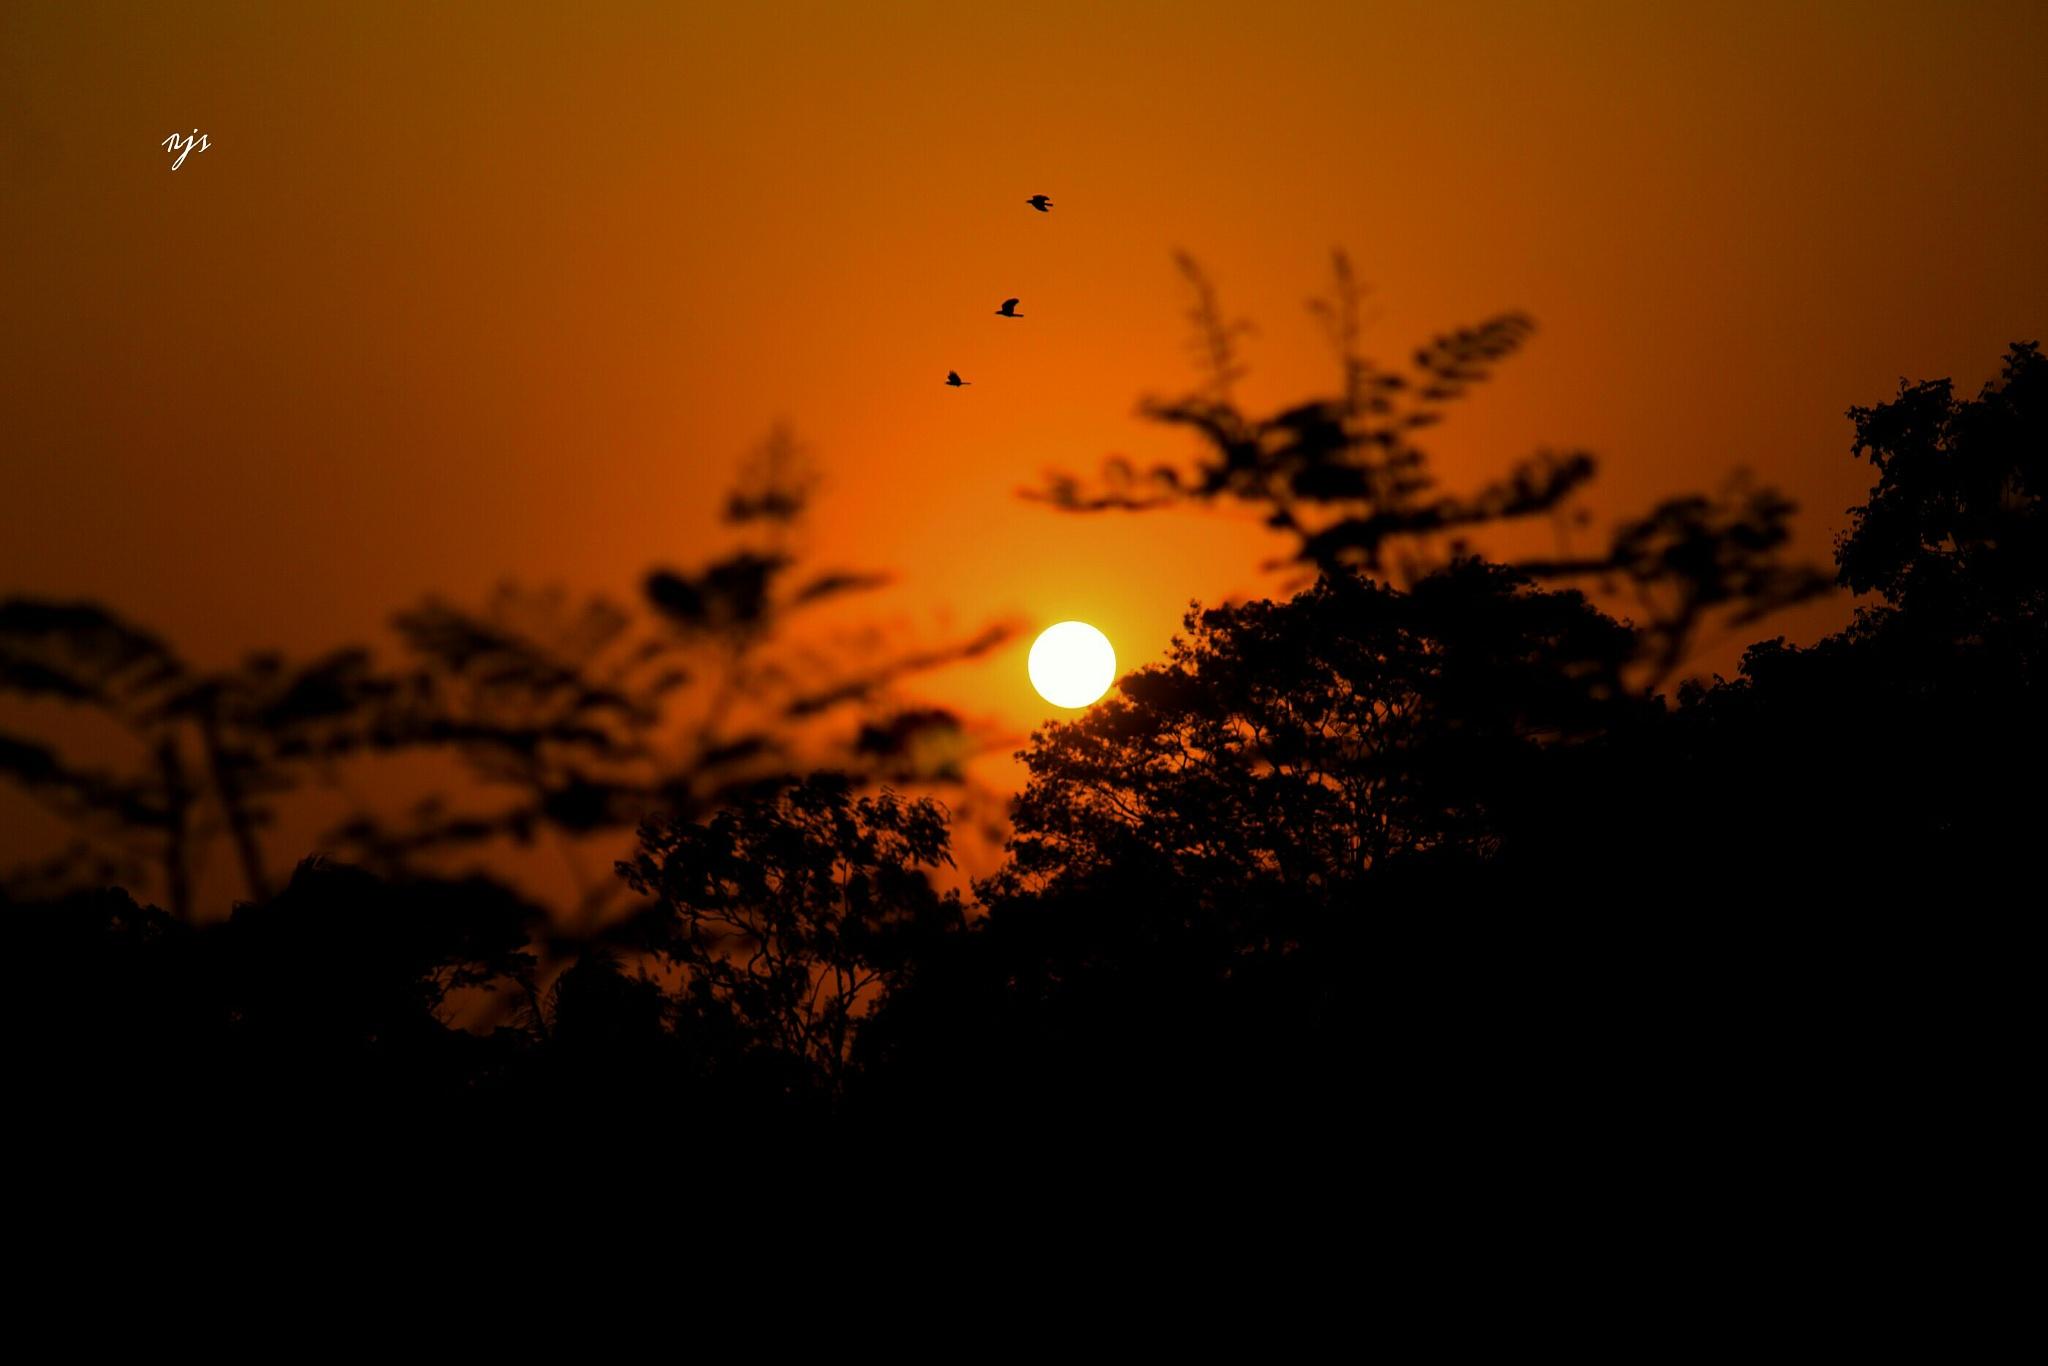 #sun by rjsraboni2013